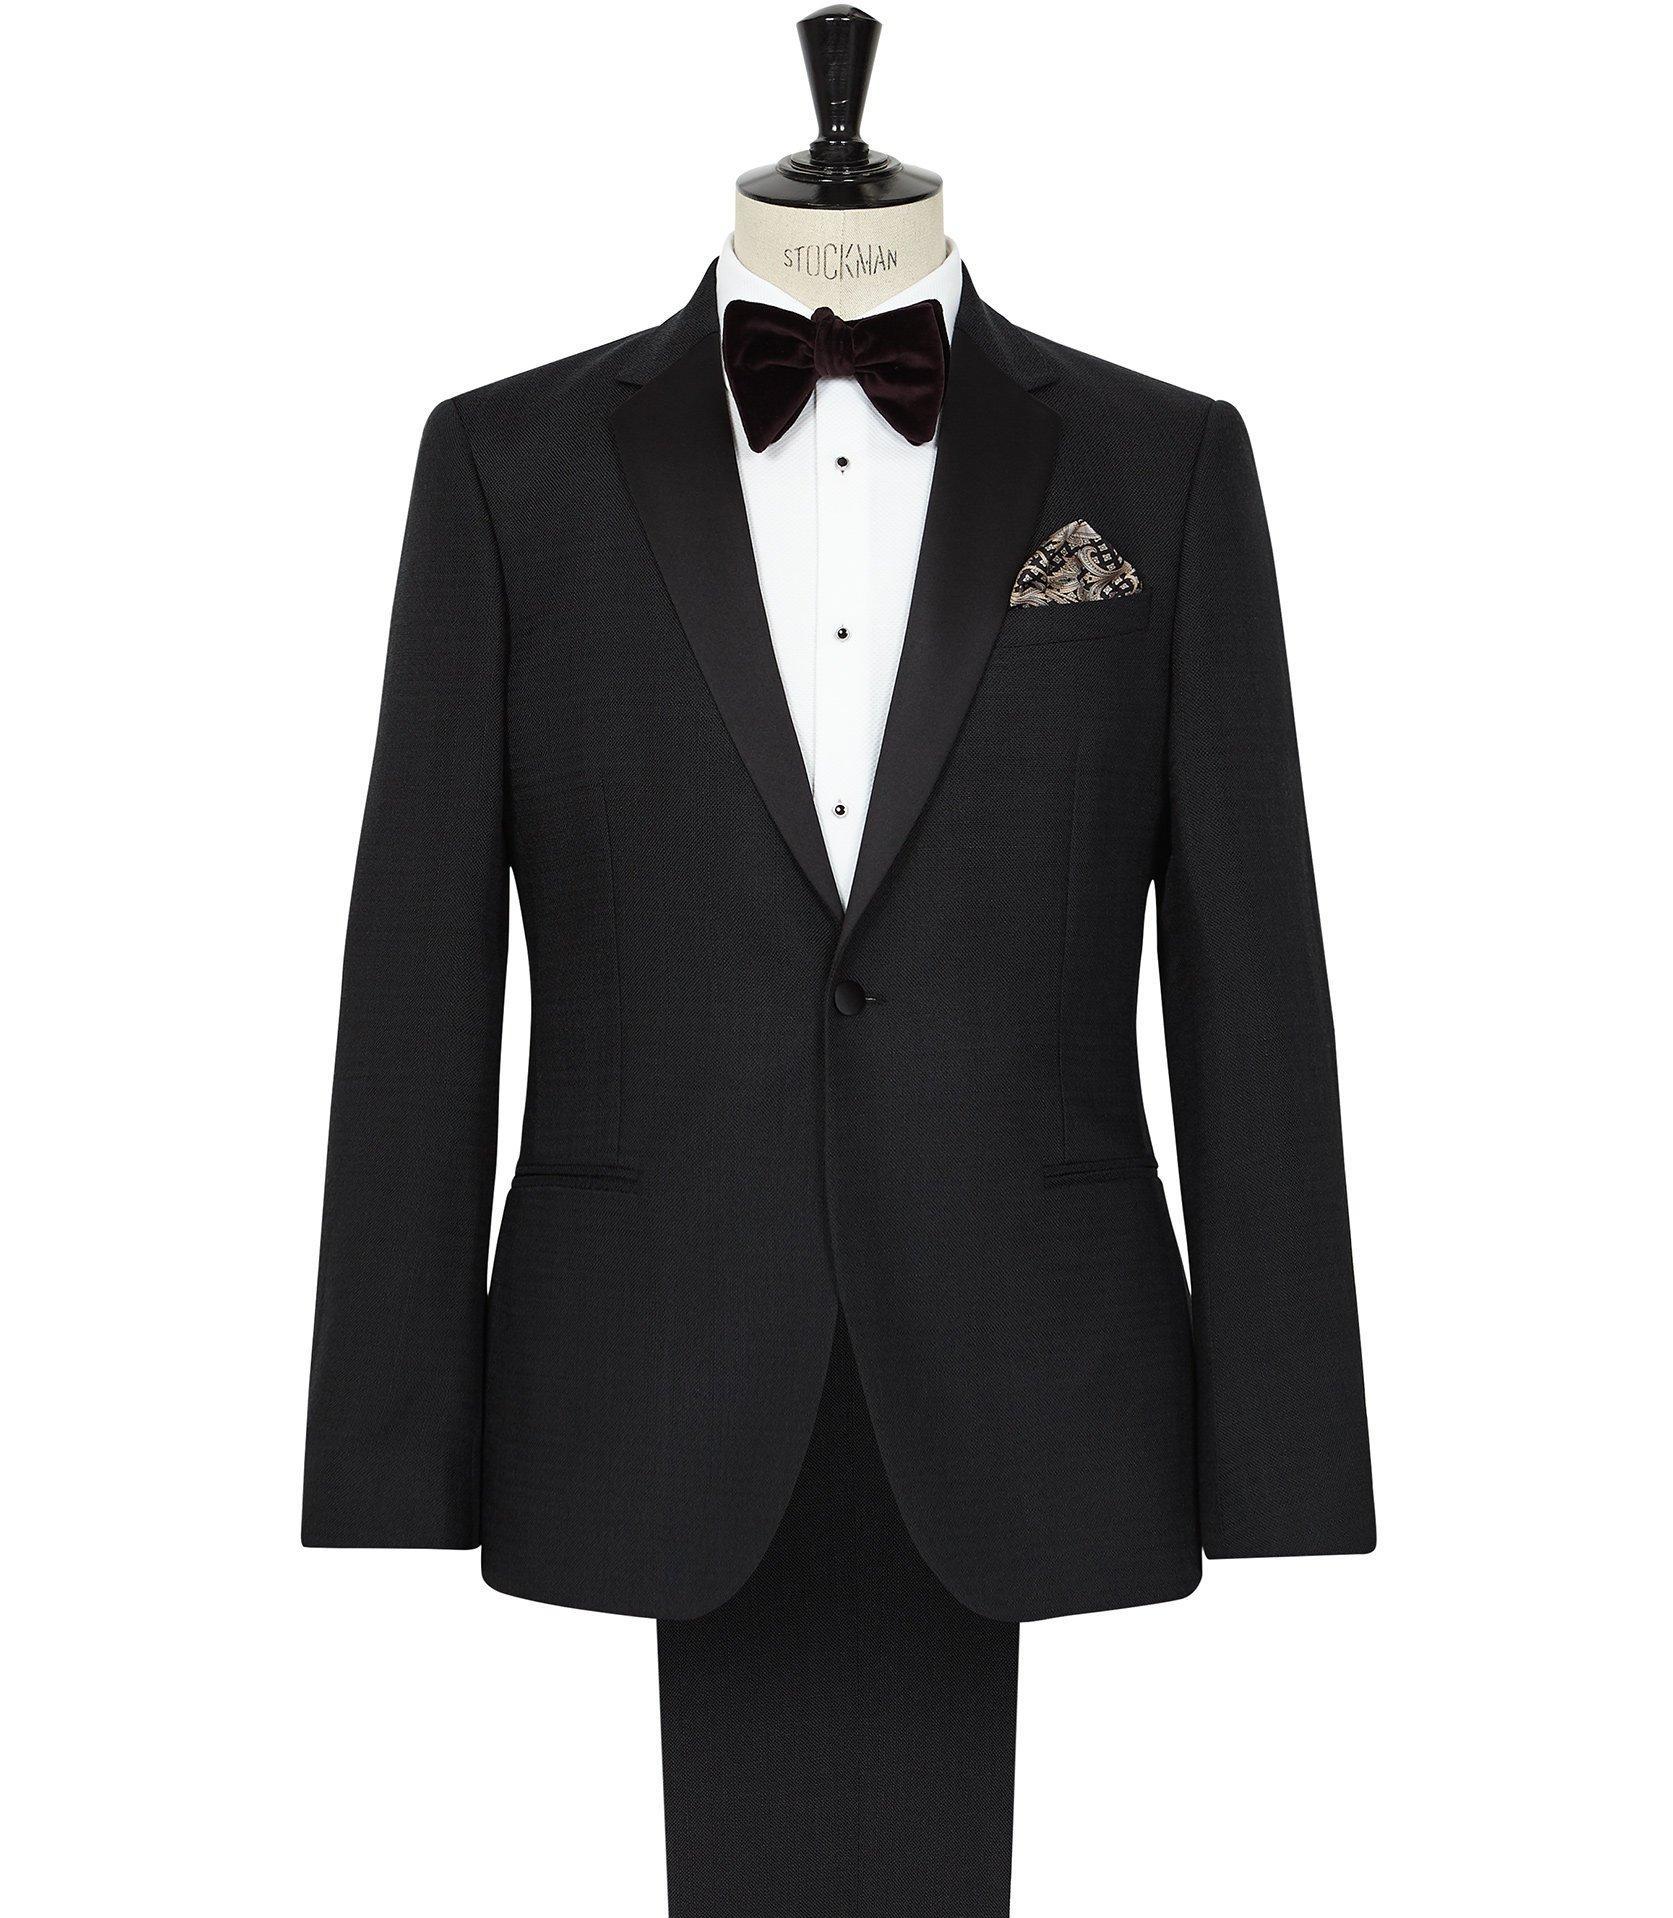 52d50b5c0962 Lyst - Reiss Pedestrian - Textured Dinner Suit in Blue for Men